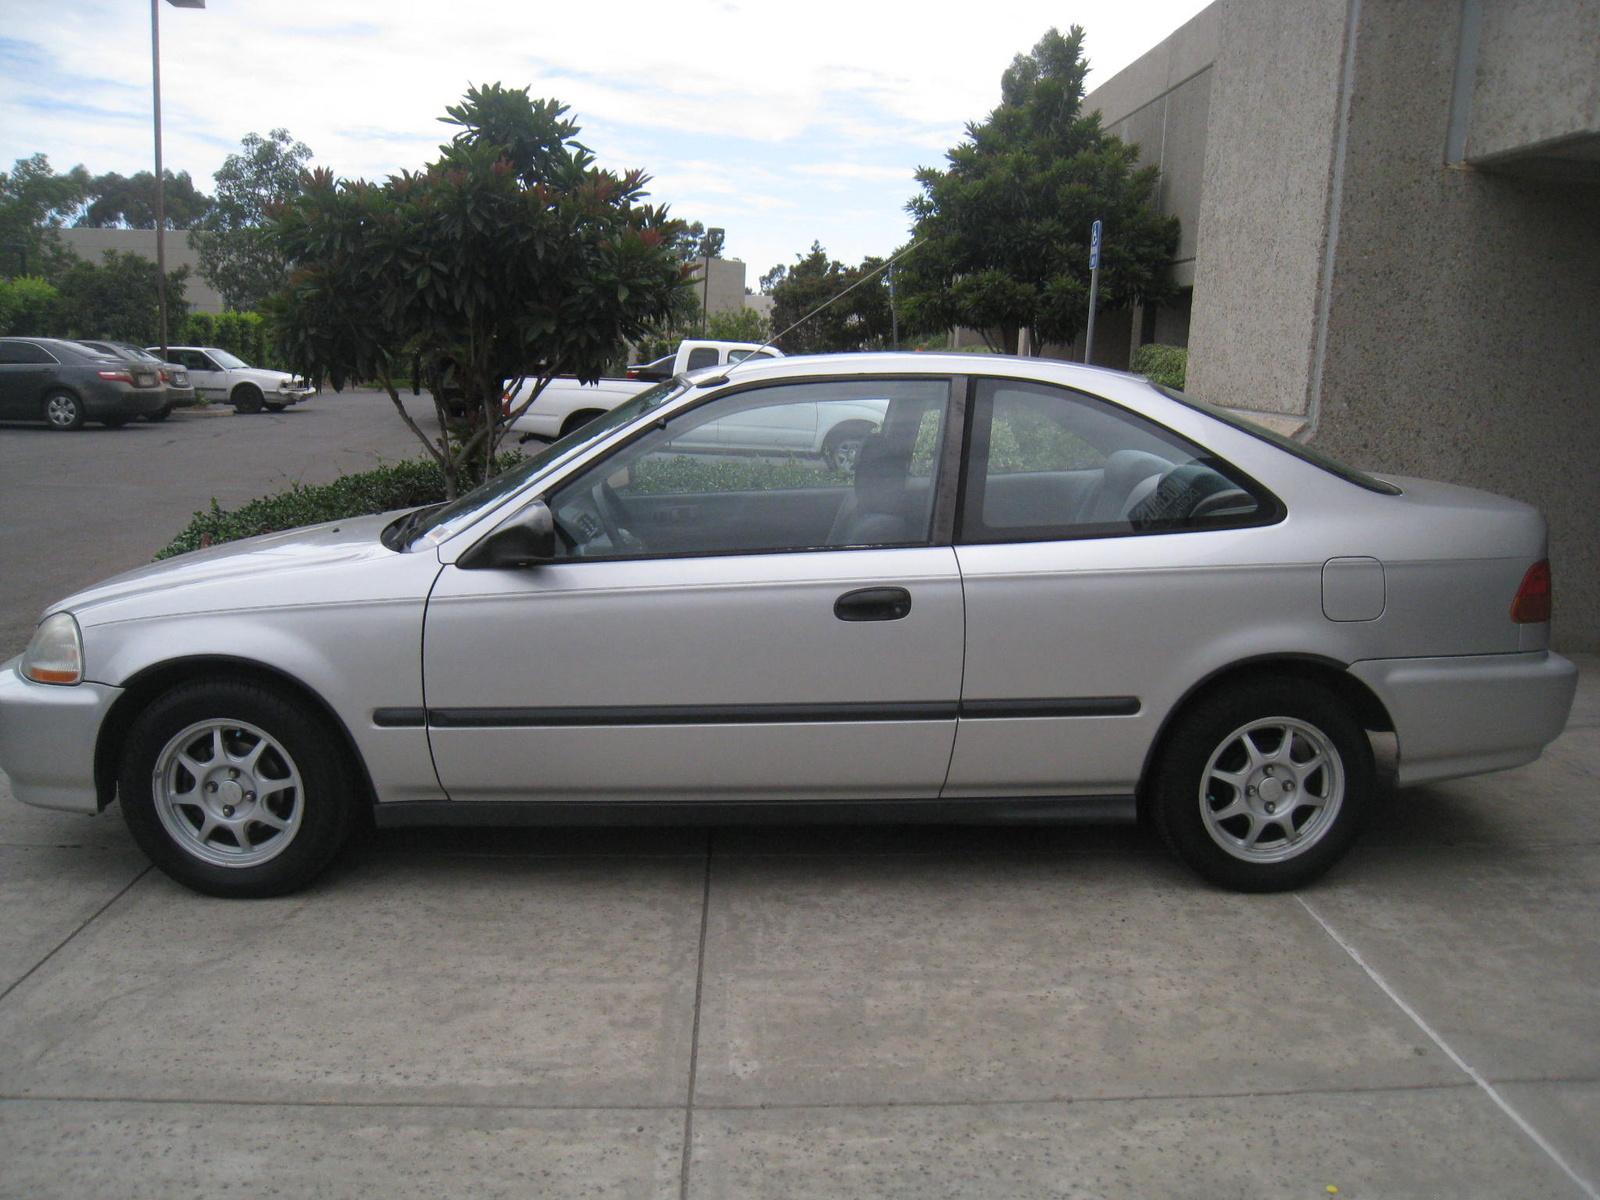 1998 Honda Accord Reviews >> 1998 Honda Civic - Pictures - CarGurus